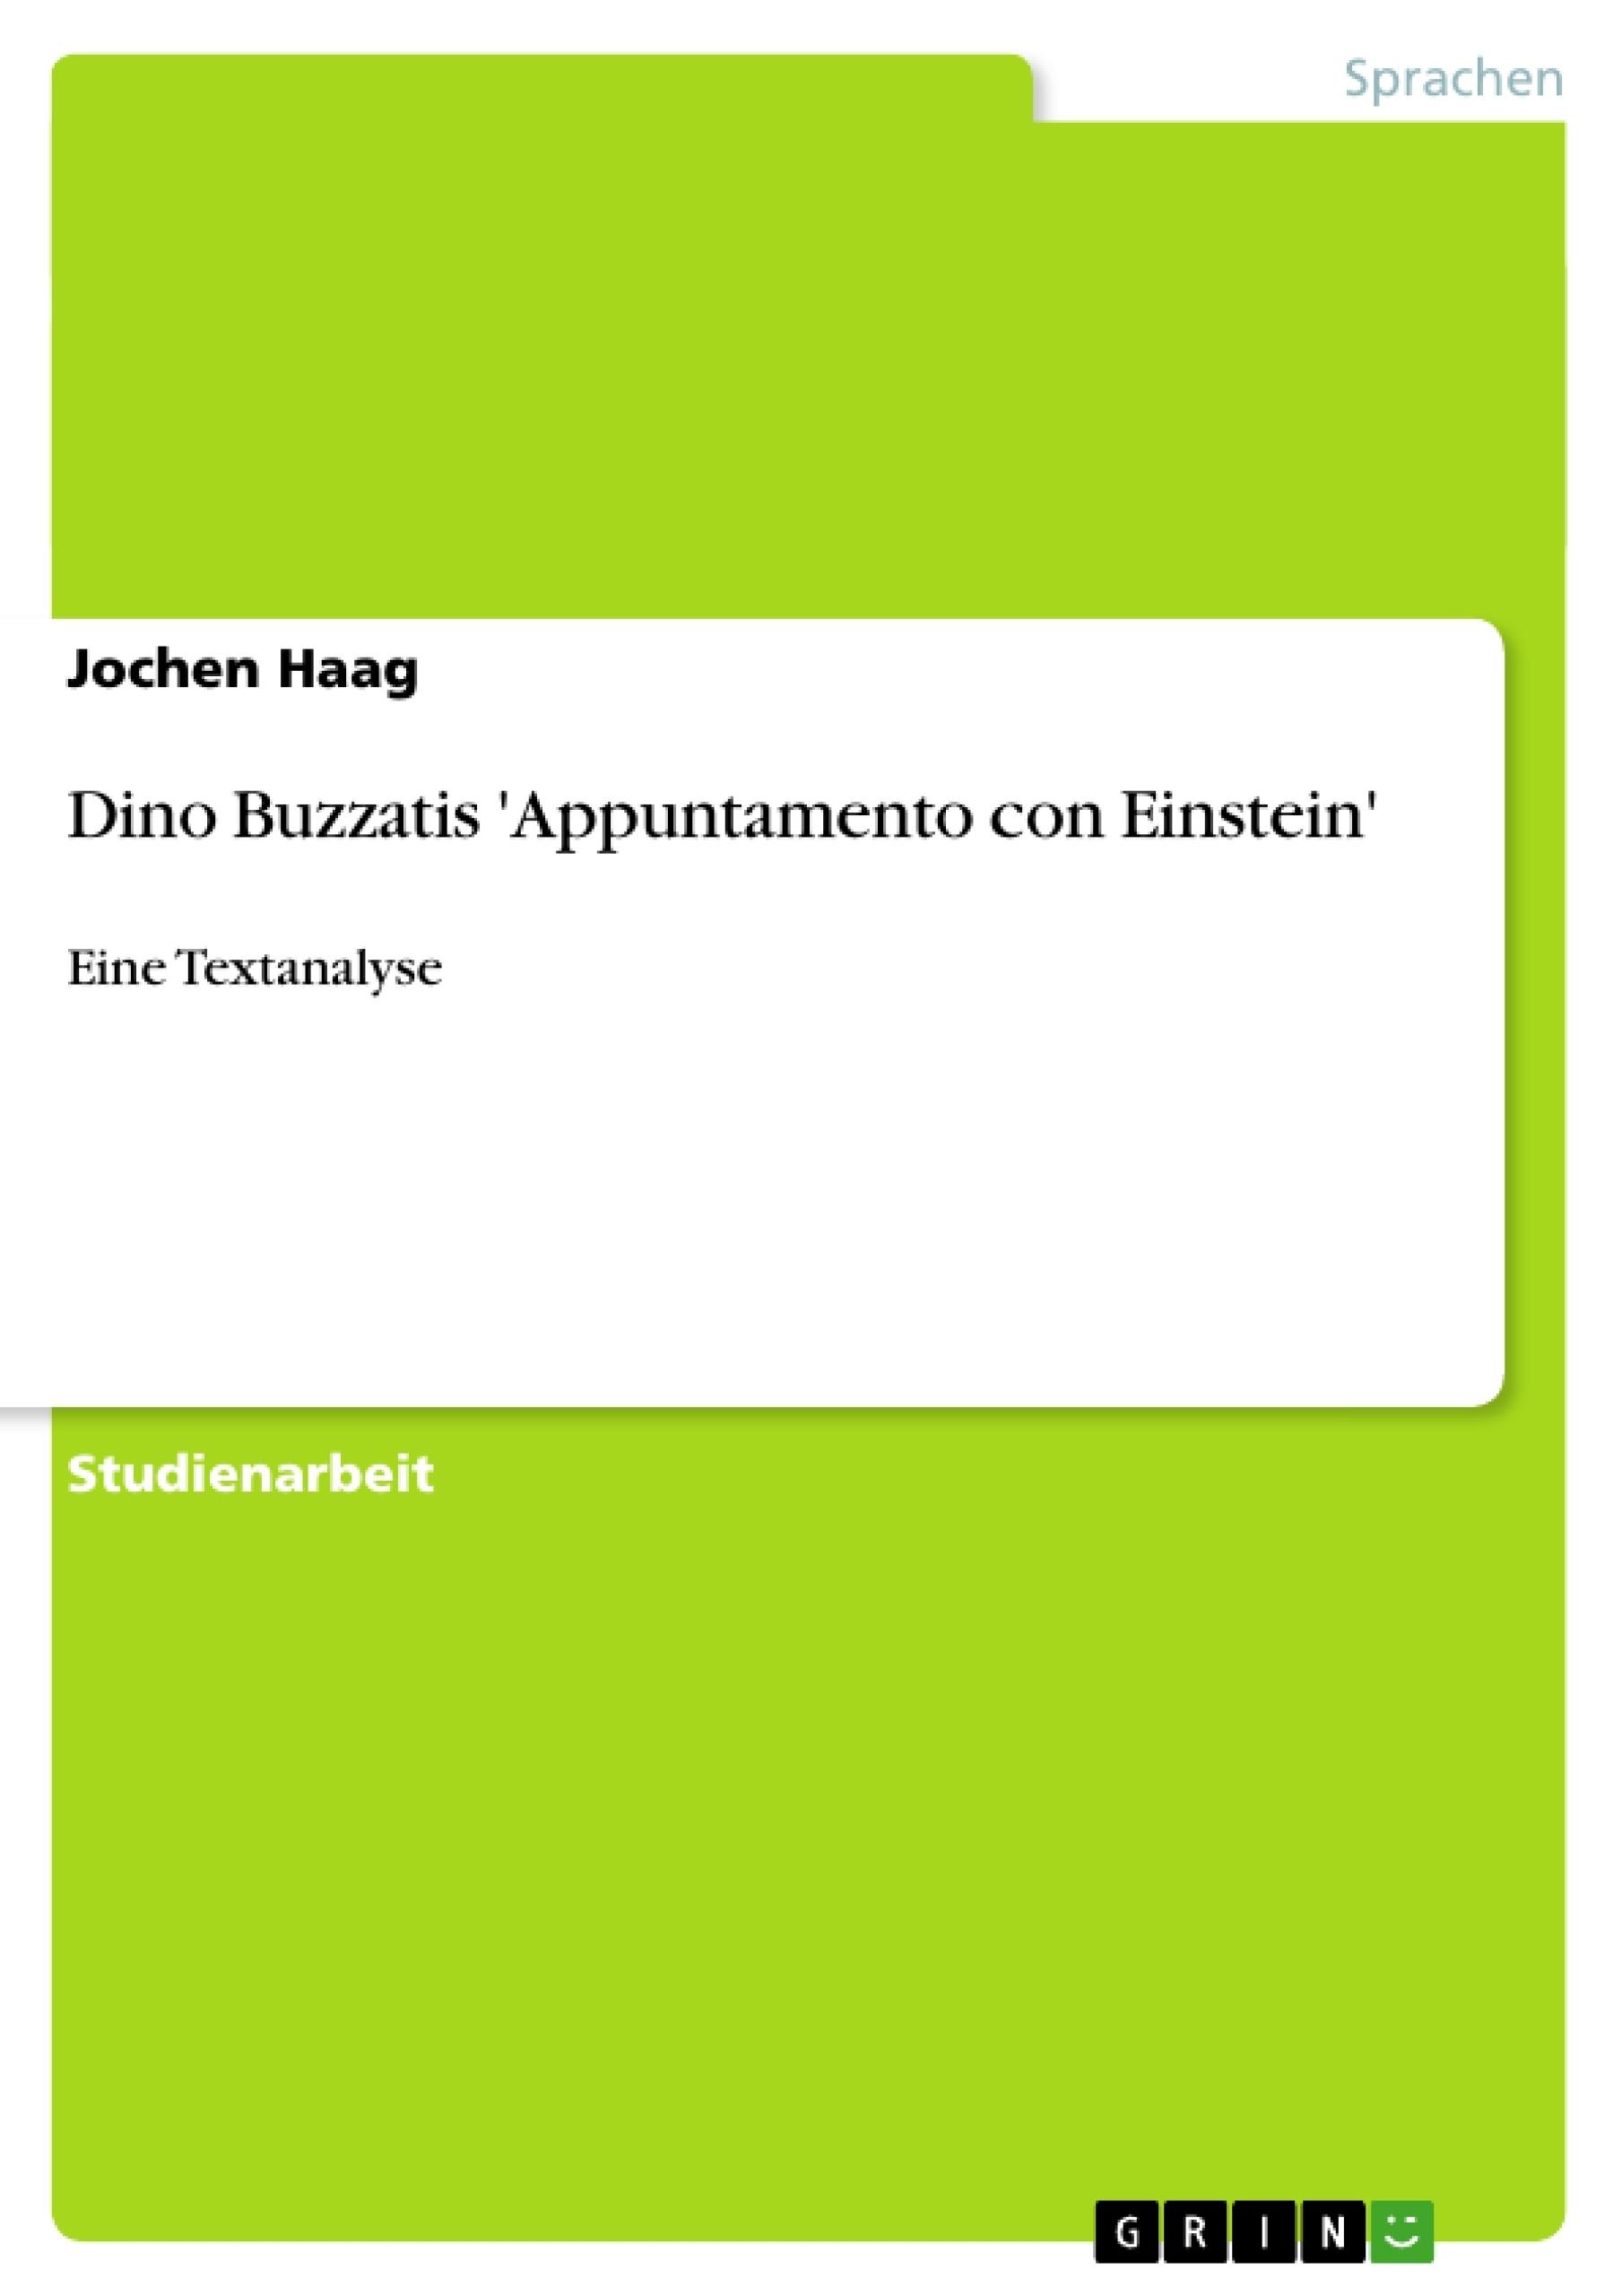 Titel: Dino Buzzatis 'Appuntamento con Einstein'